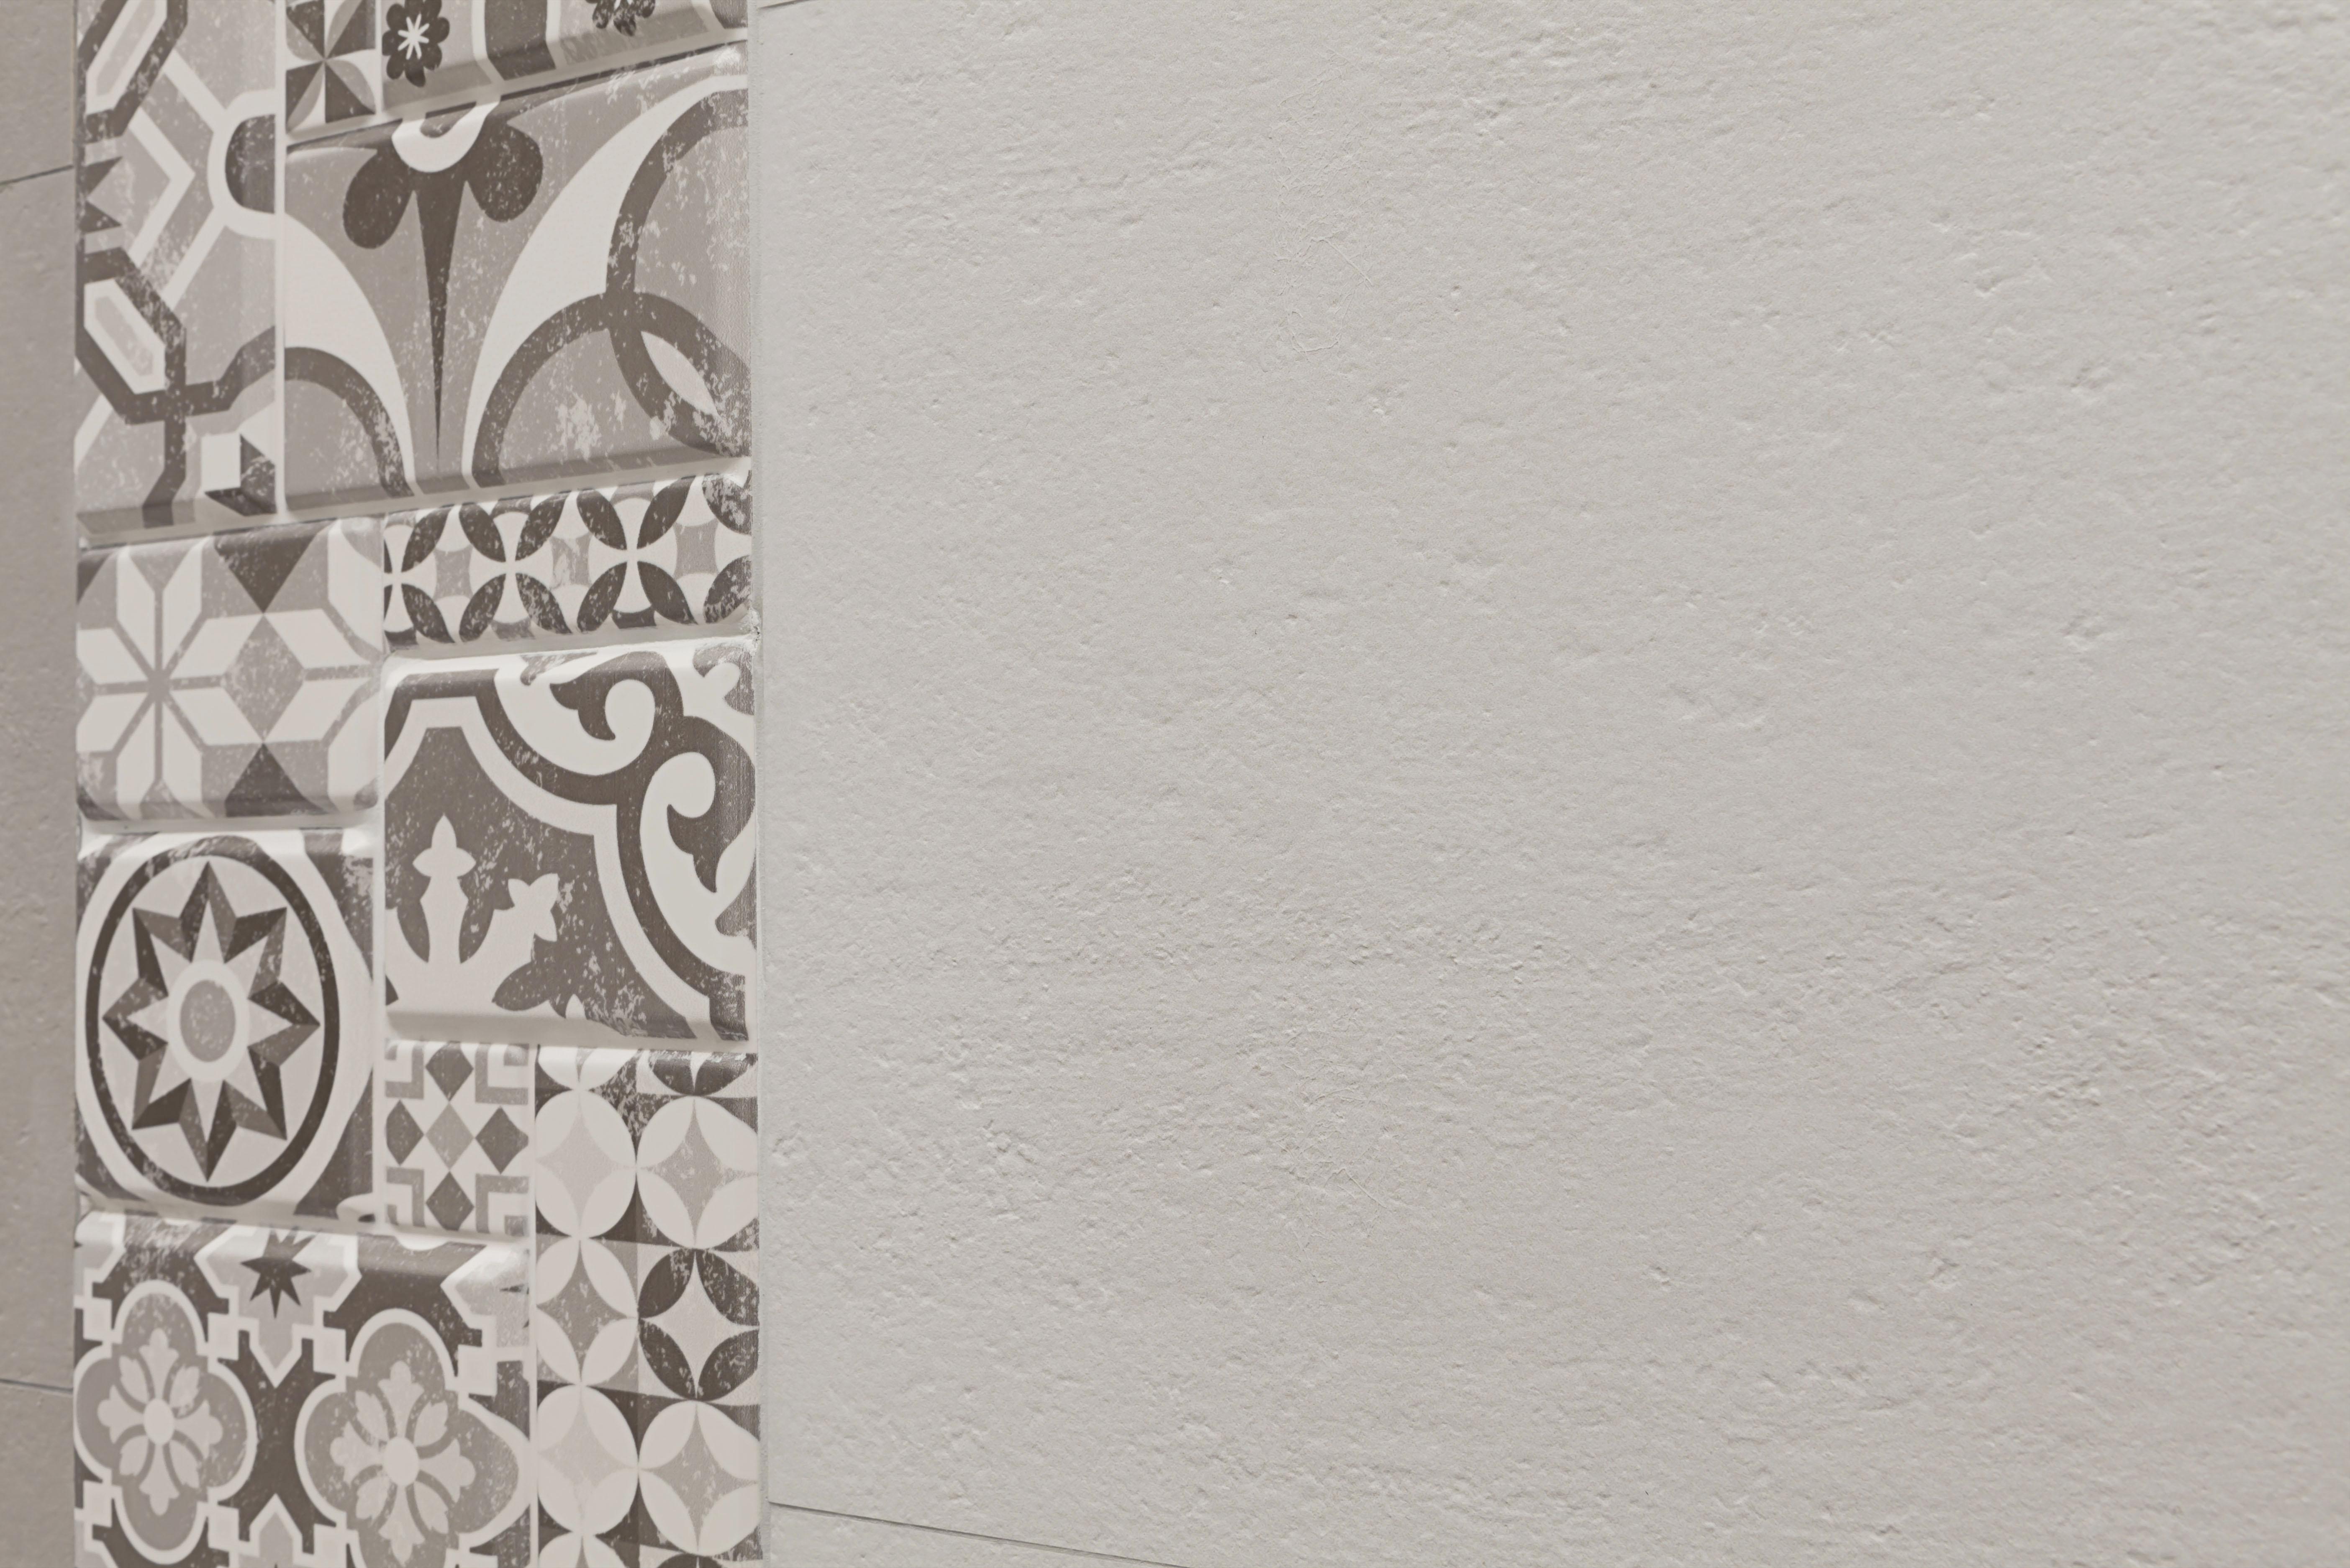 Испанская плитка Azulev коллекция Vulcano